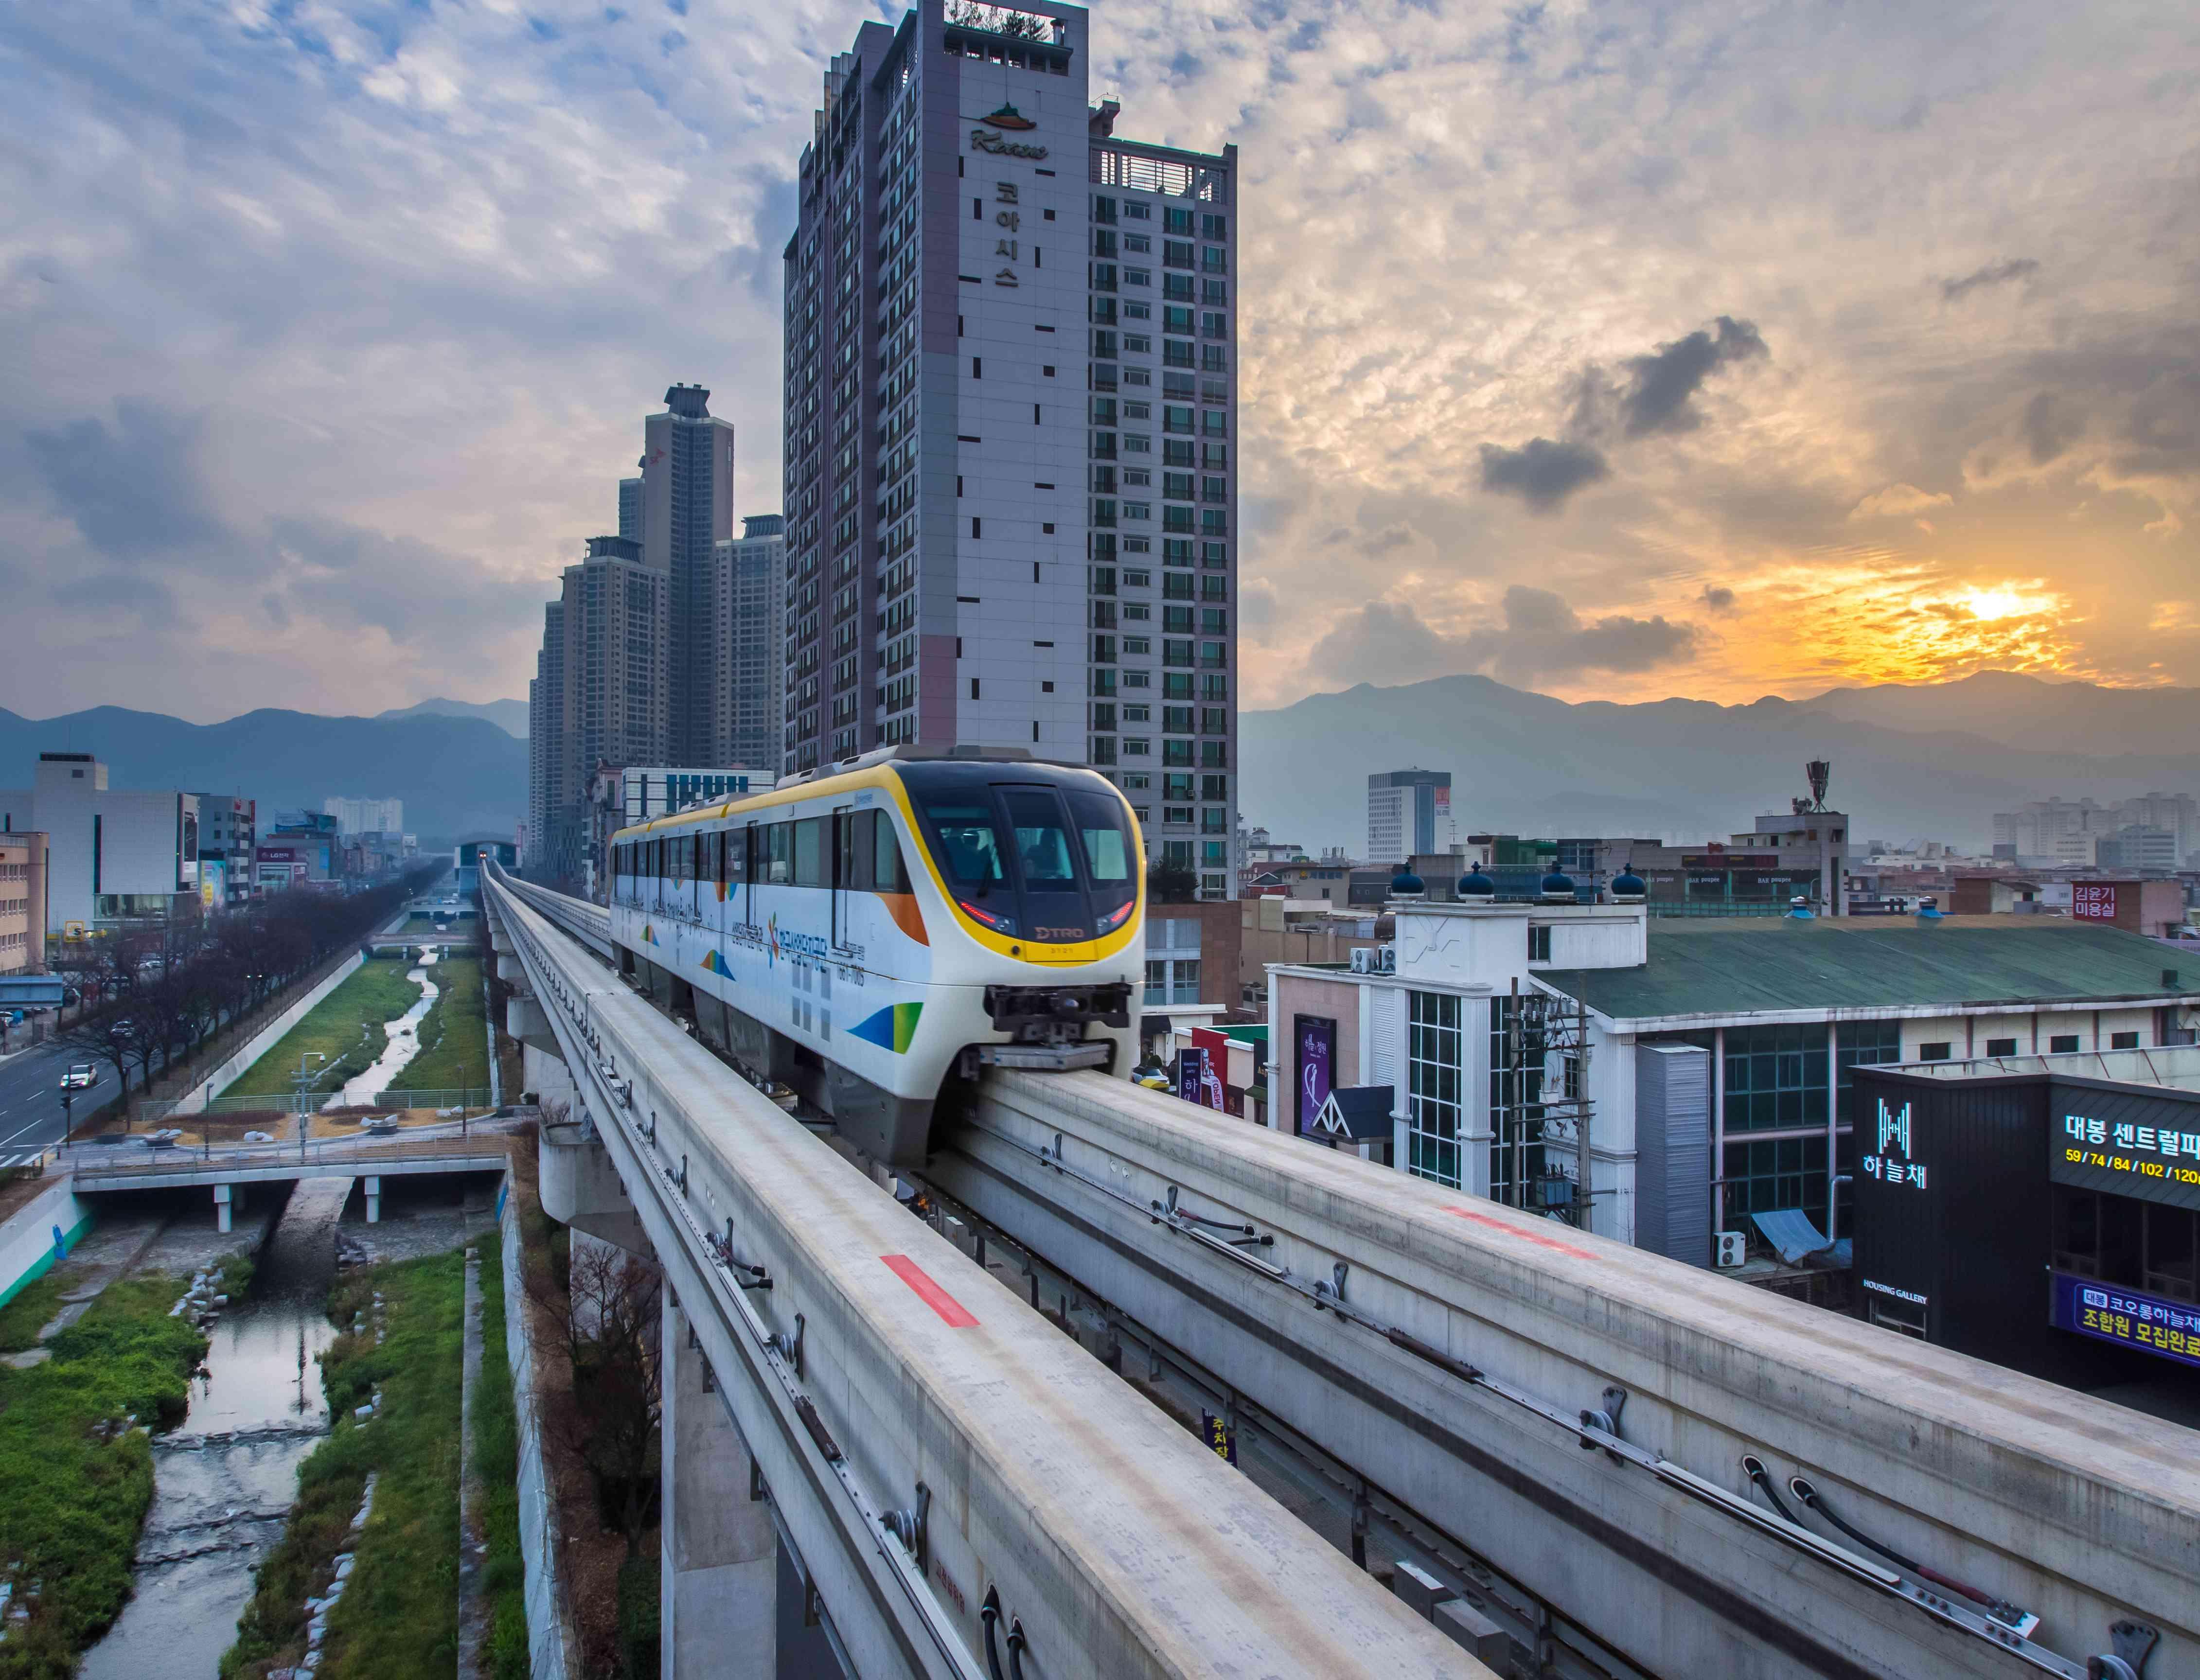 Monorail in Daegu, South Korea